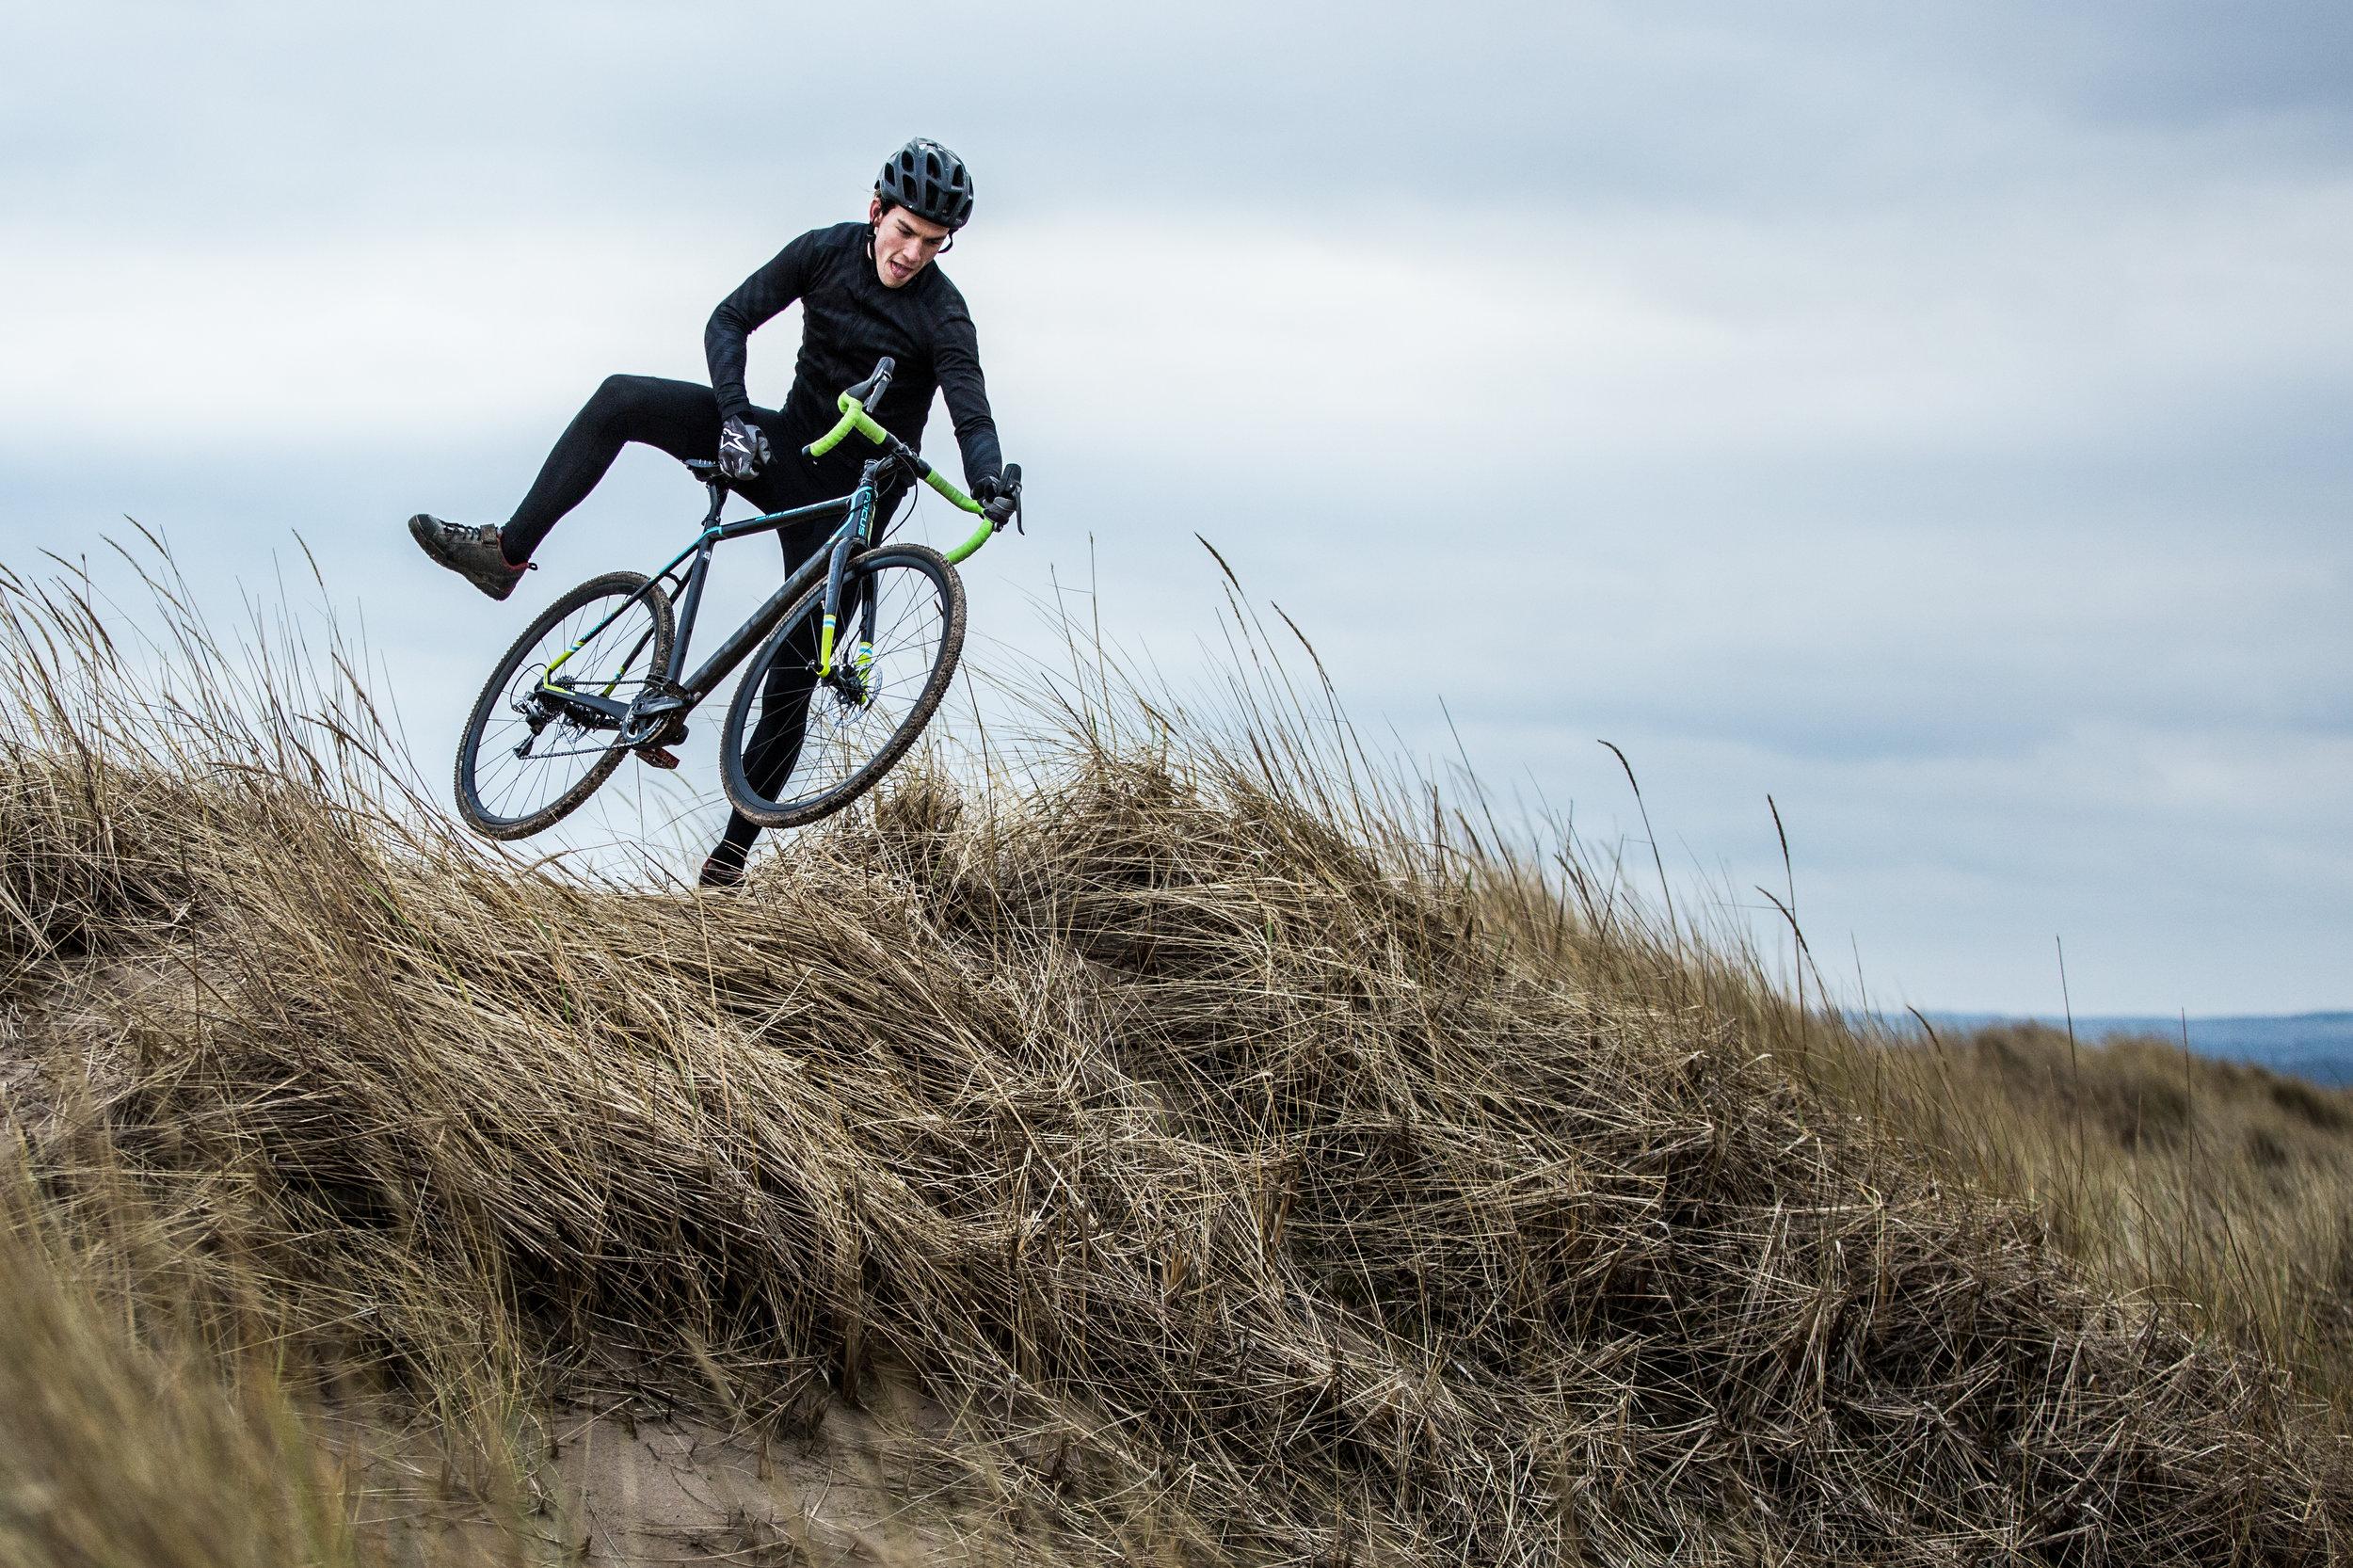 Escapade7_JoeConnell-Cyclocross-4.jpg